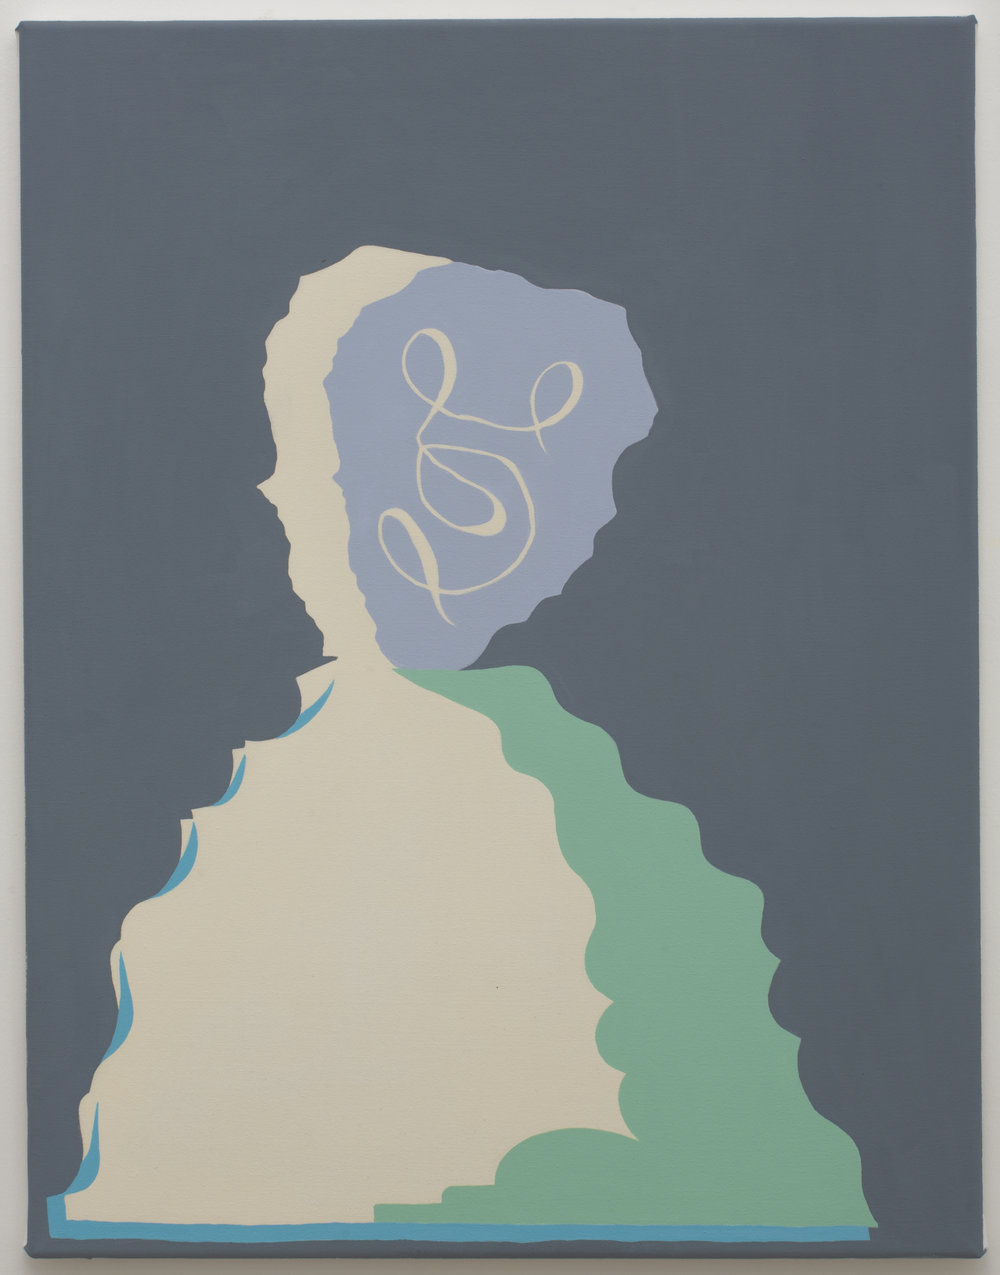 MICHELLE HANLIN  Man Mountain  2018  Vinyl paint on canvas 66 x 51 cm